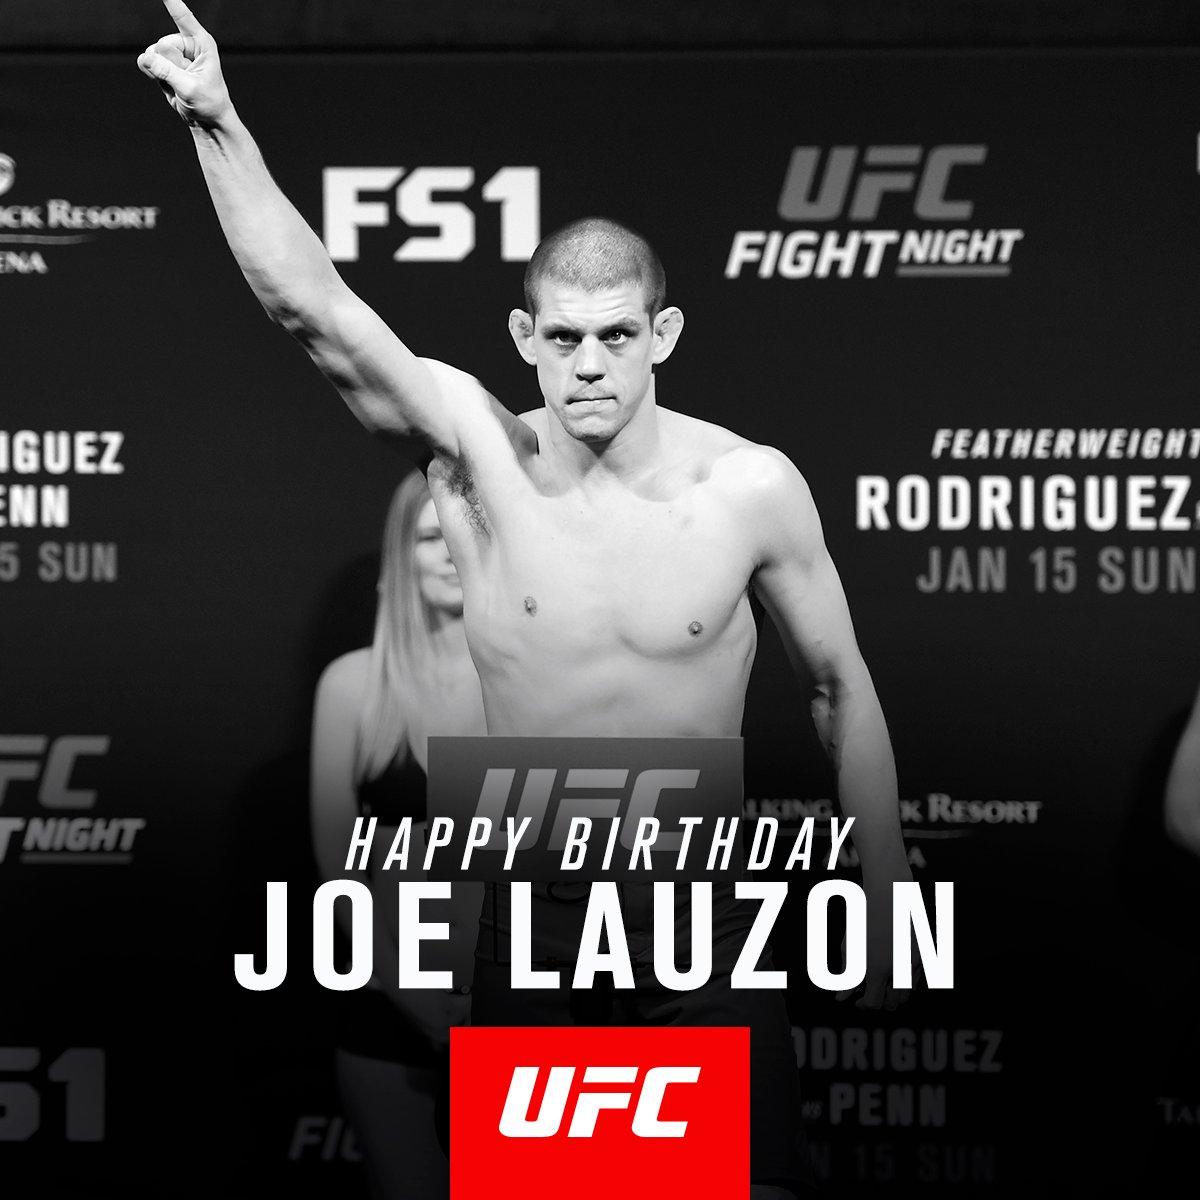 Happy Birthday to @JoeLauzon! ���� https://t.co/L0MlsZZi6W